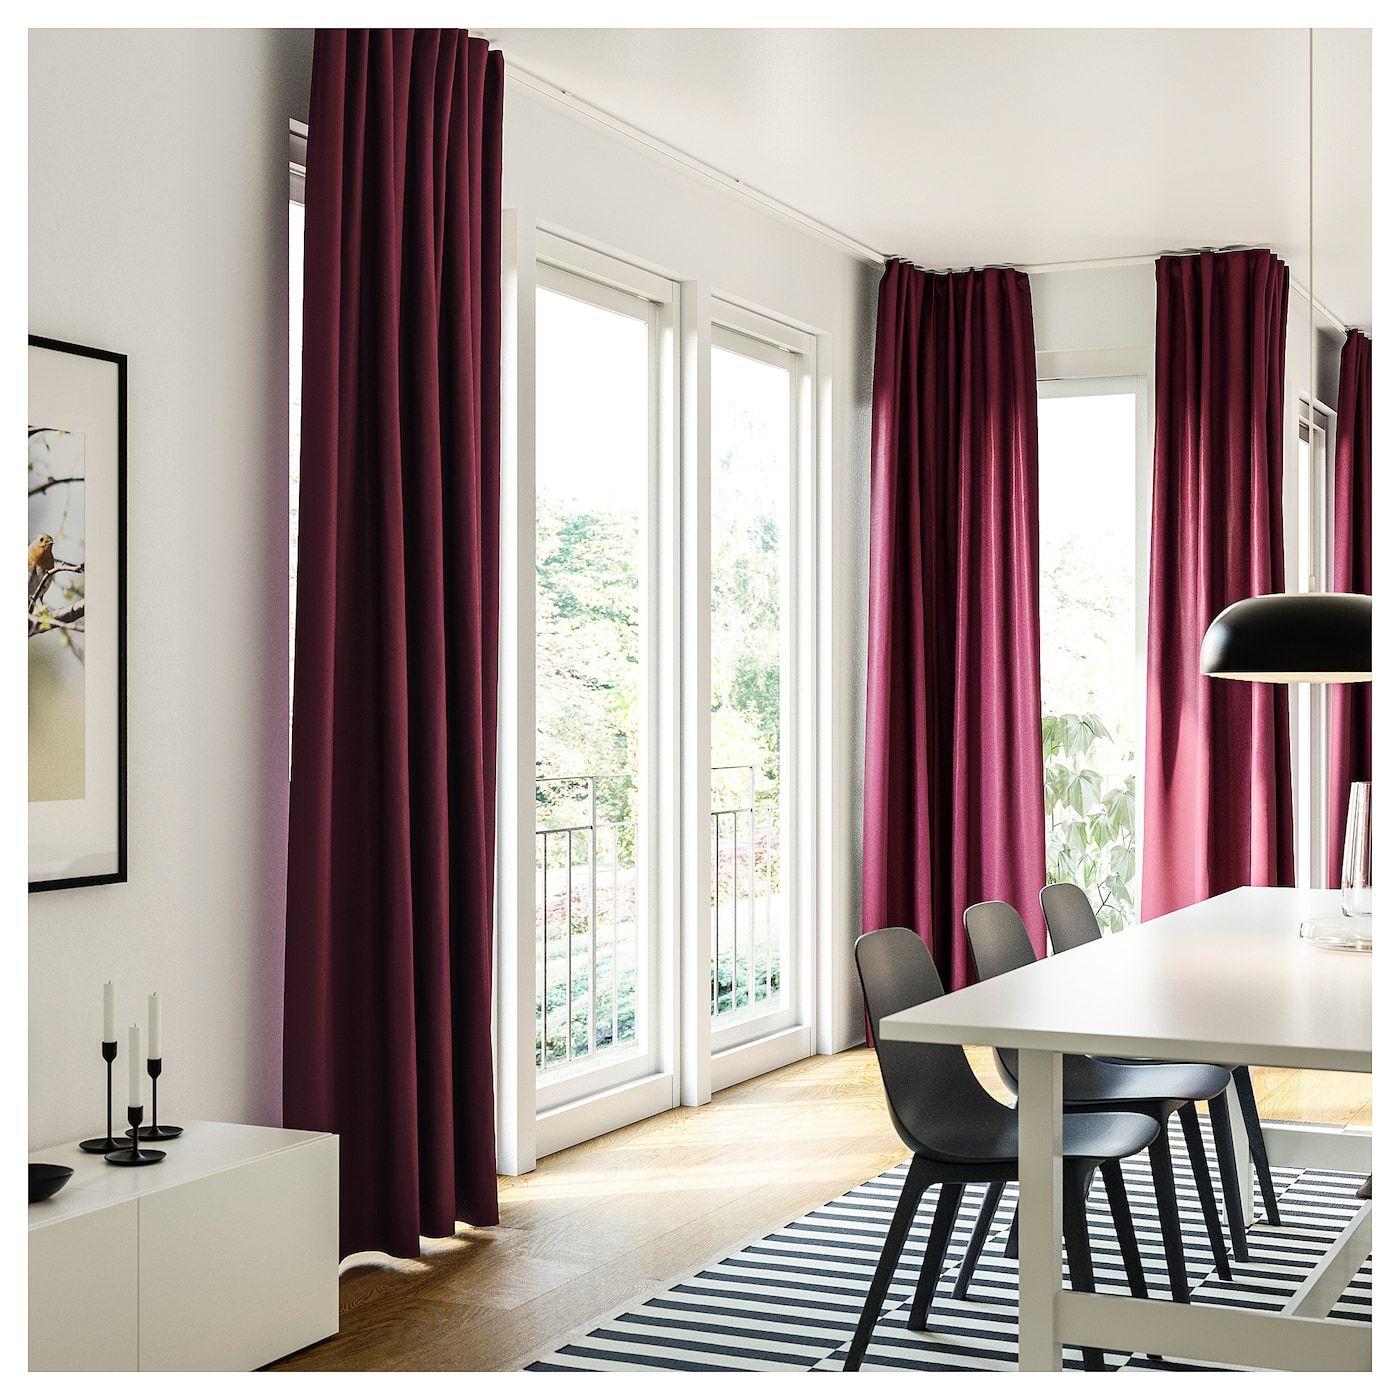 Ikea Vidga Corner Solution Living Room Windows Floor To